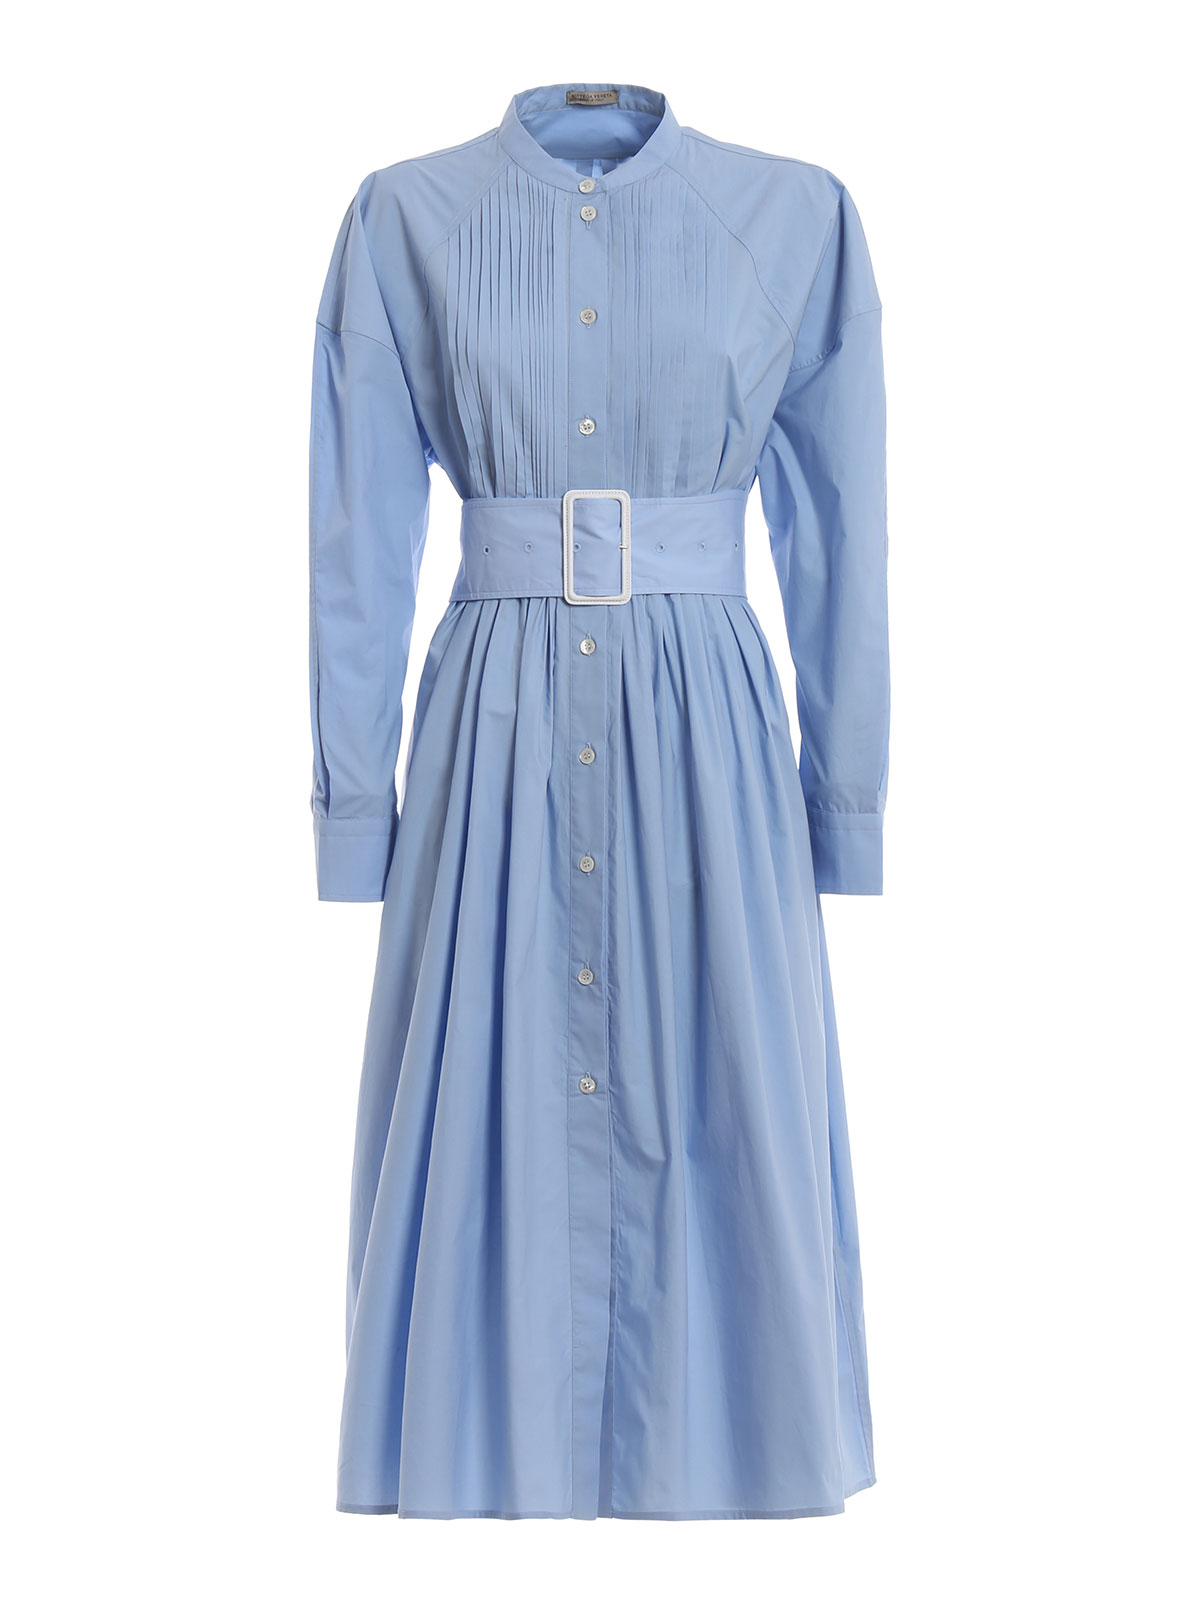 Bottega Veneta Cotton Shirt Dress With High Belt Knee